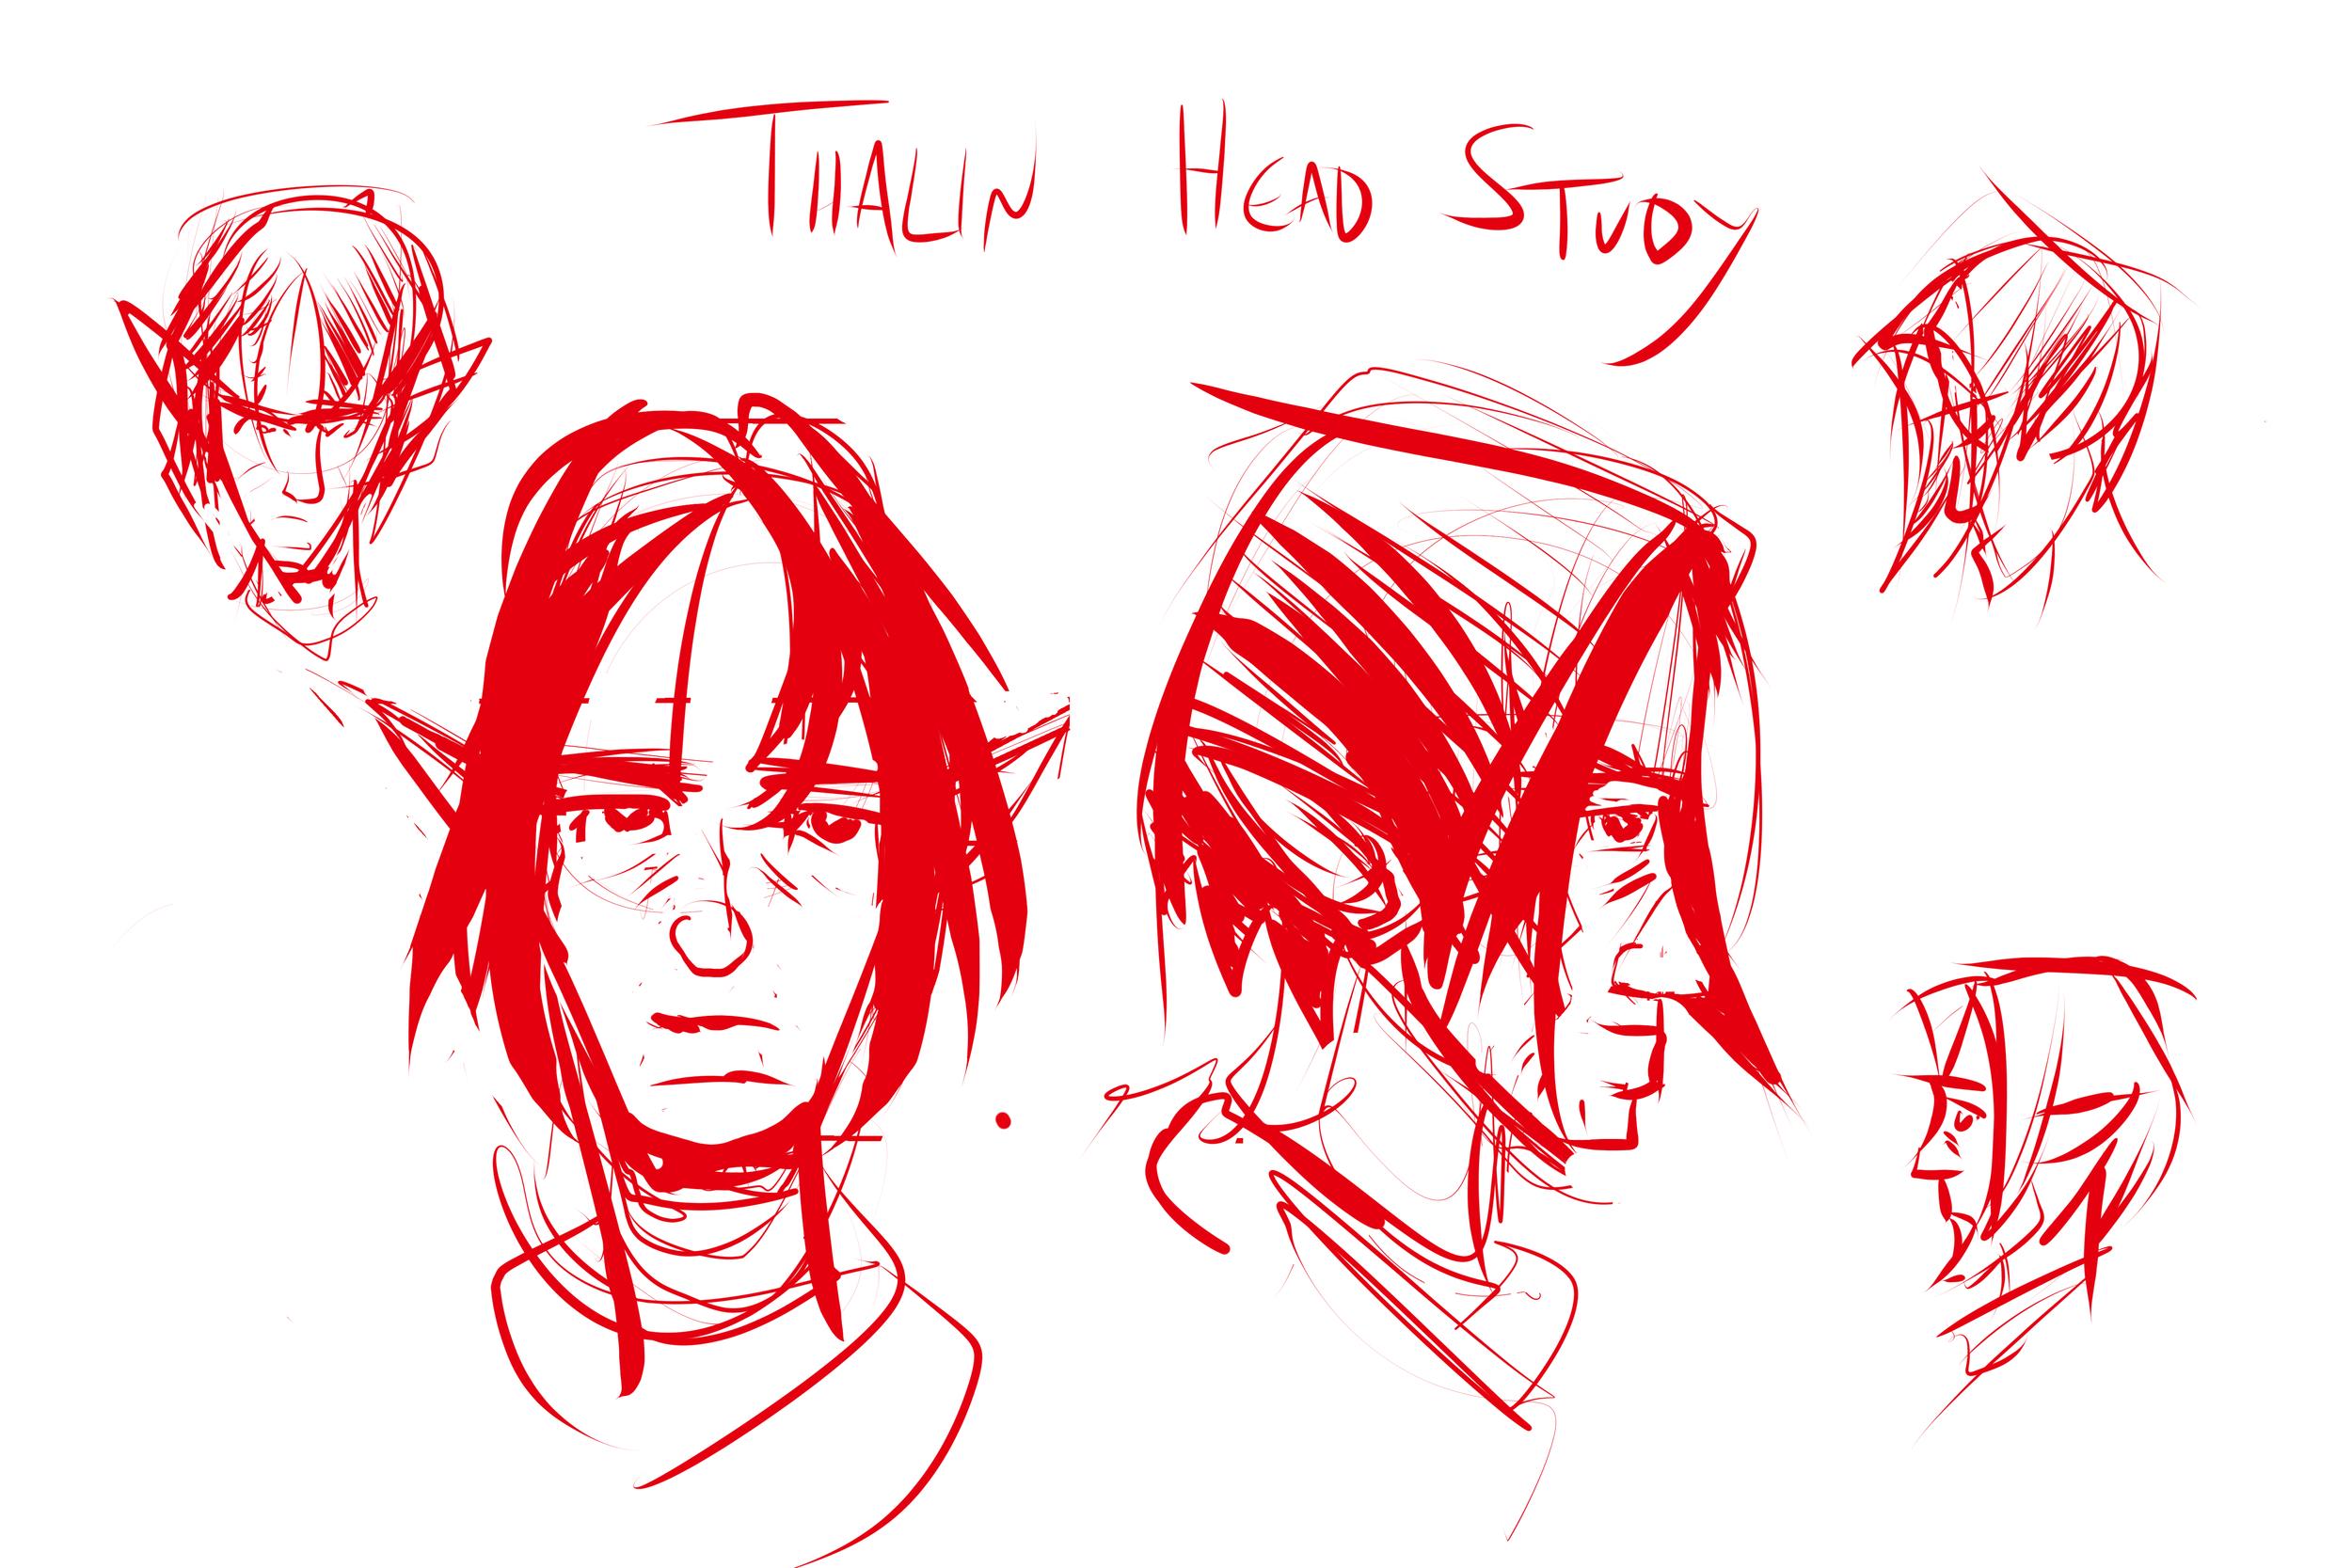 thalin head study.jpg